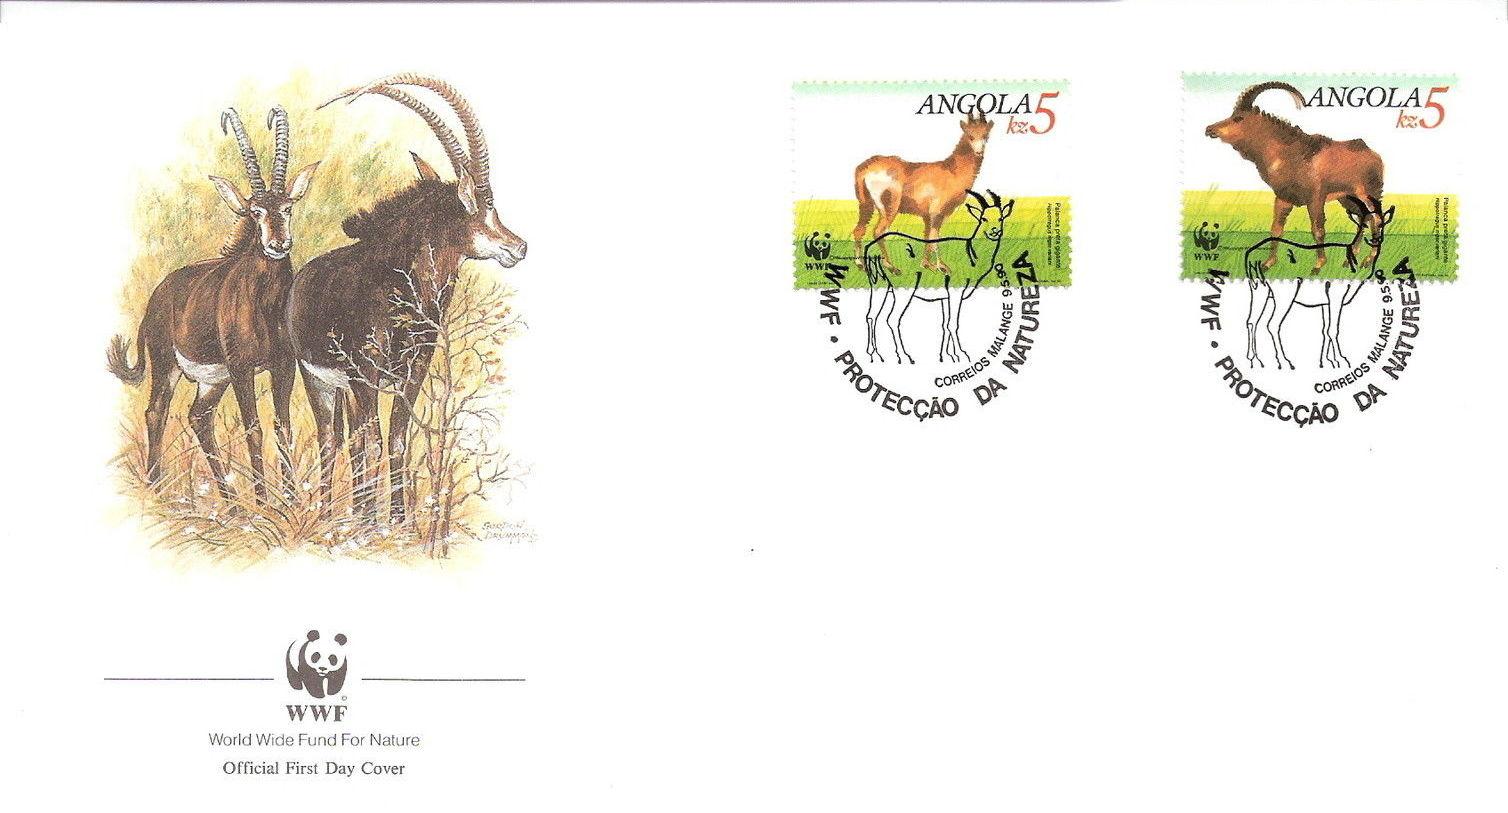 Angola 1990 WWF - Giant Sable Antelope FDCe.jpg